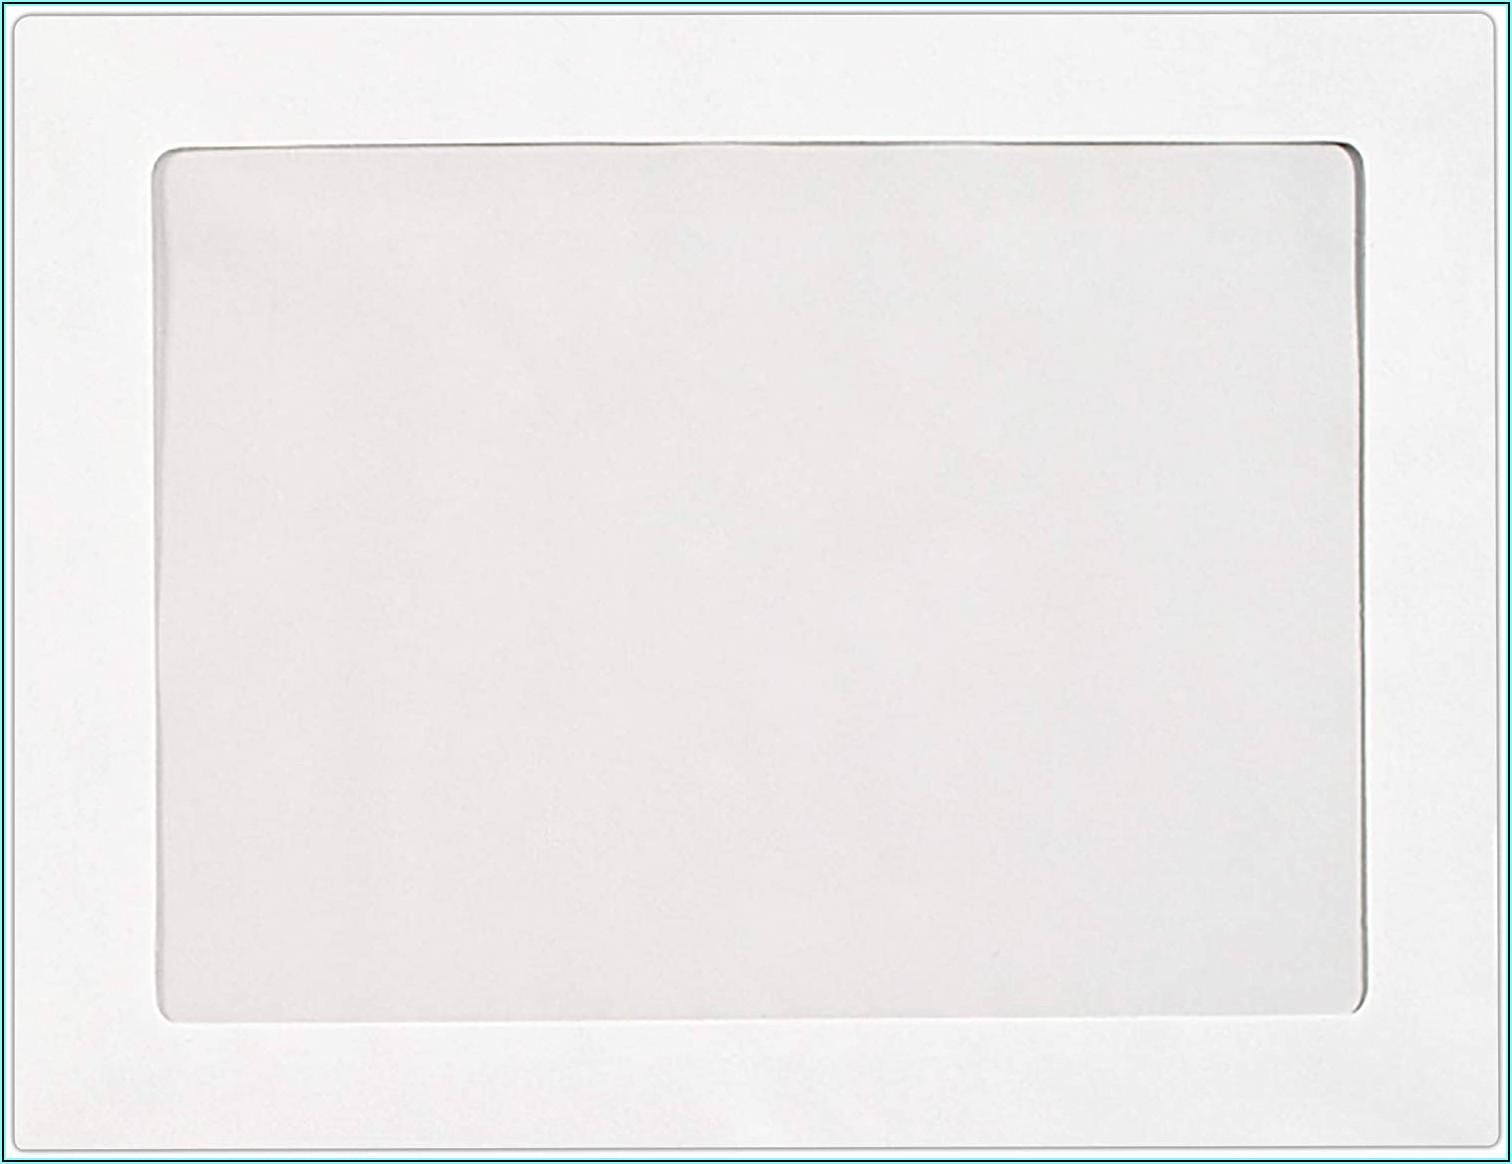 9x12 Catalog Window Envelopes